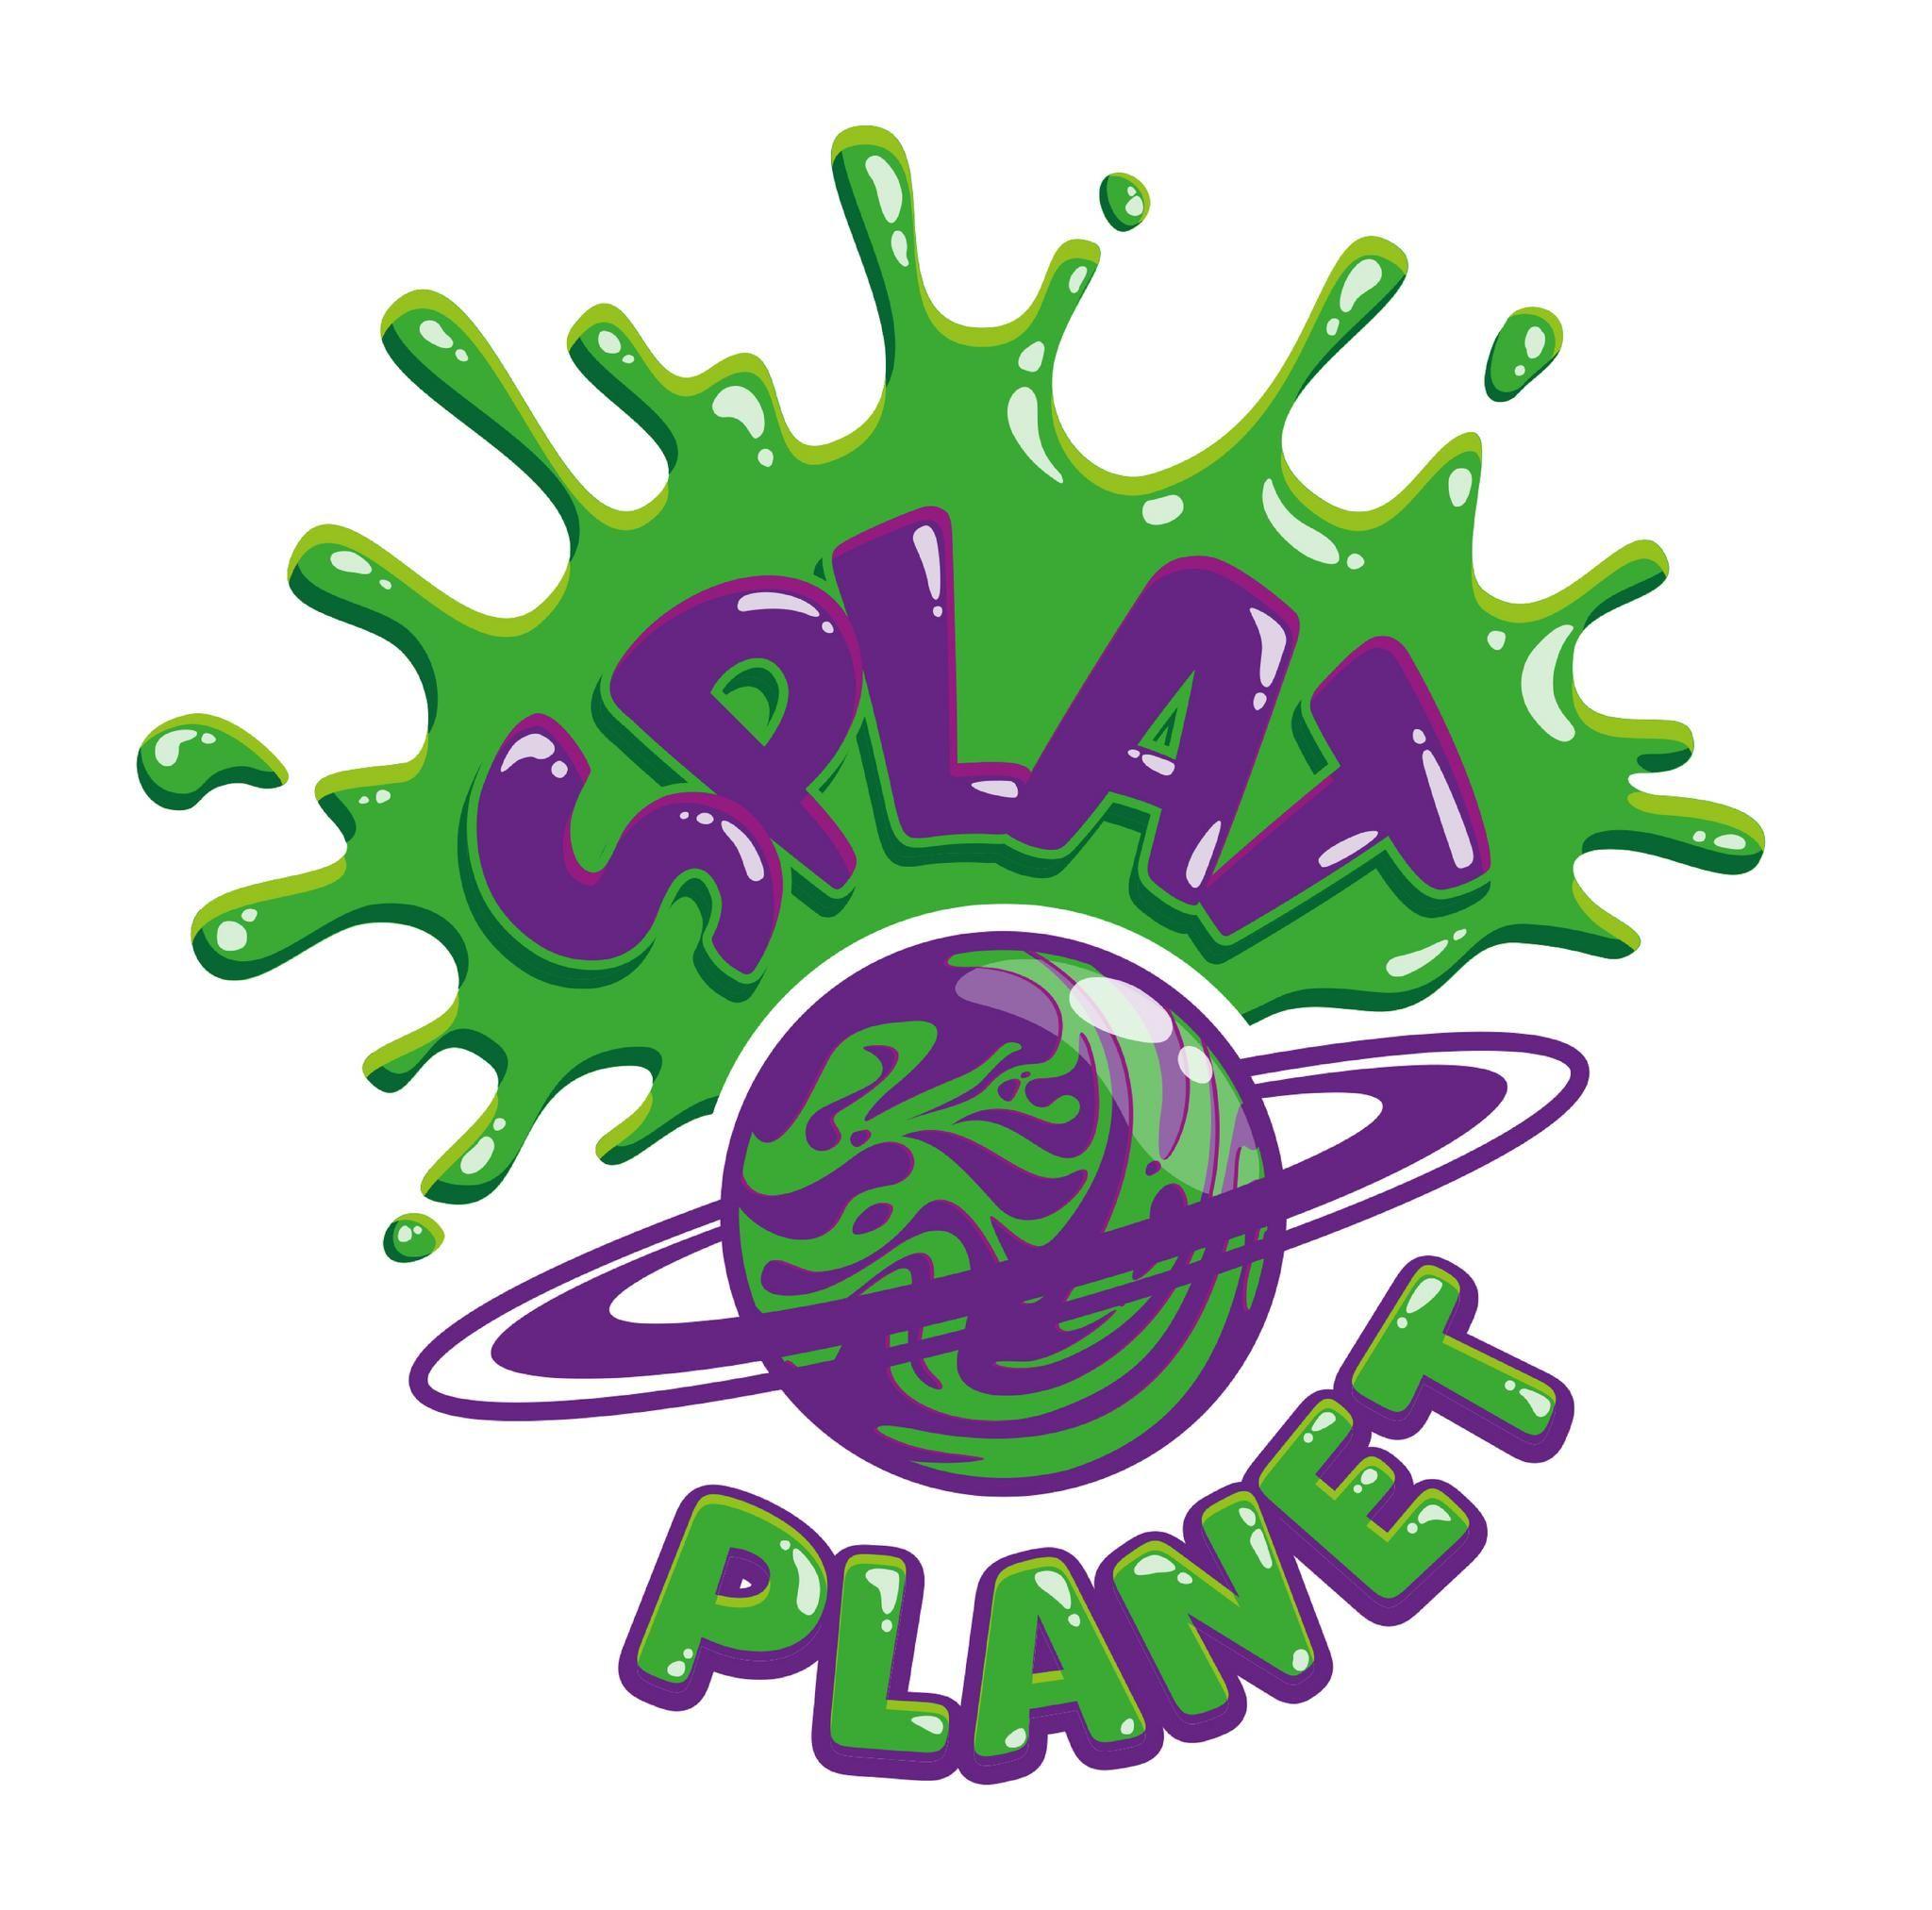 Splat Planet